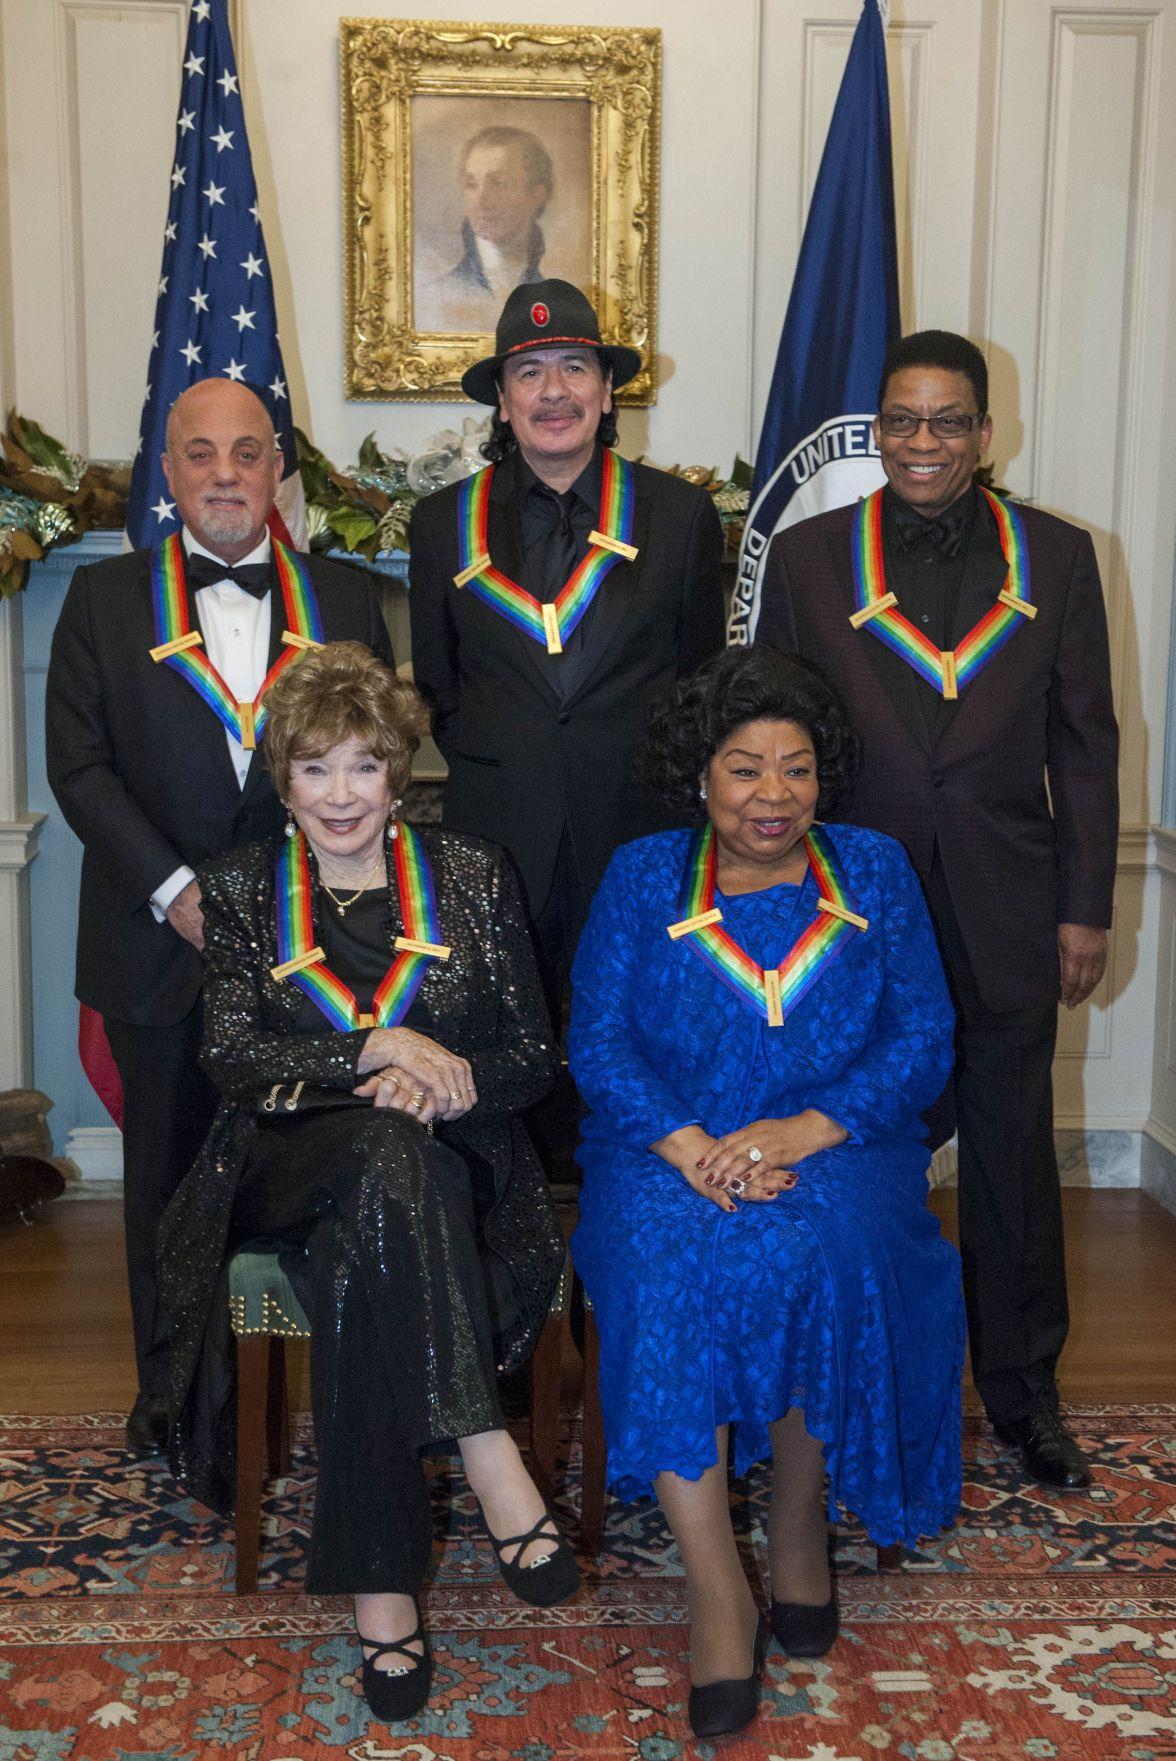 Billy Joel, Carlos Santana, Herbie Hancock and Shirley MacLaine among Kennedy Center Honors recipients